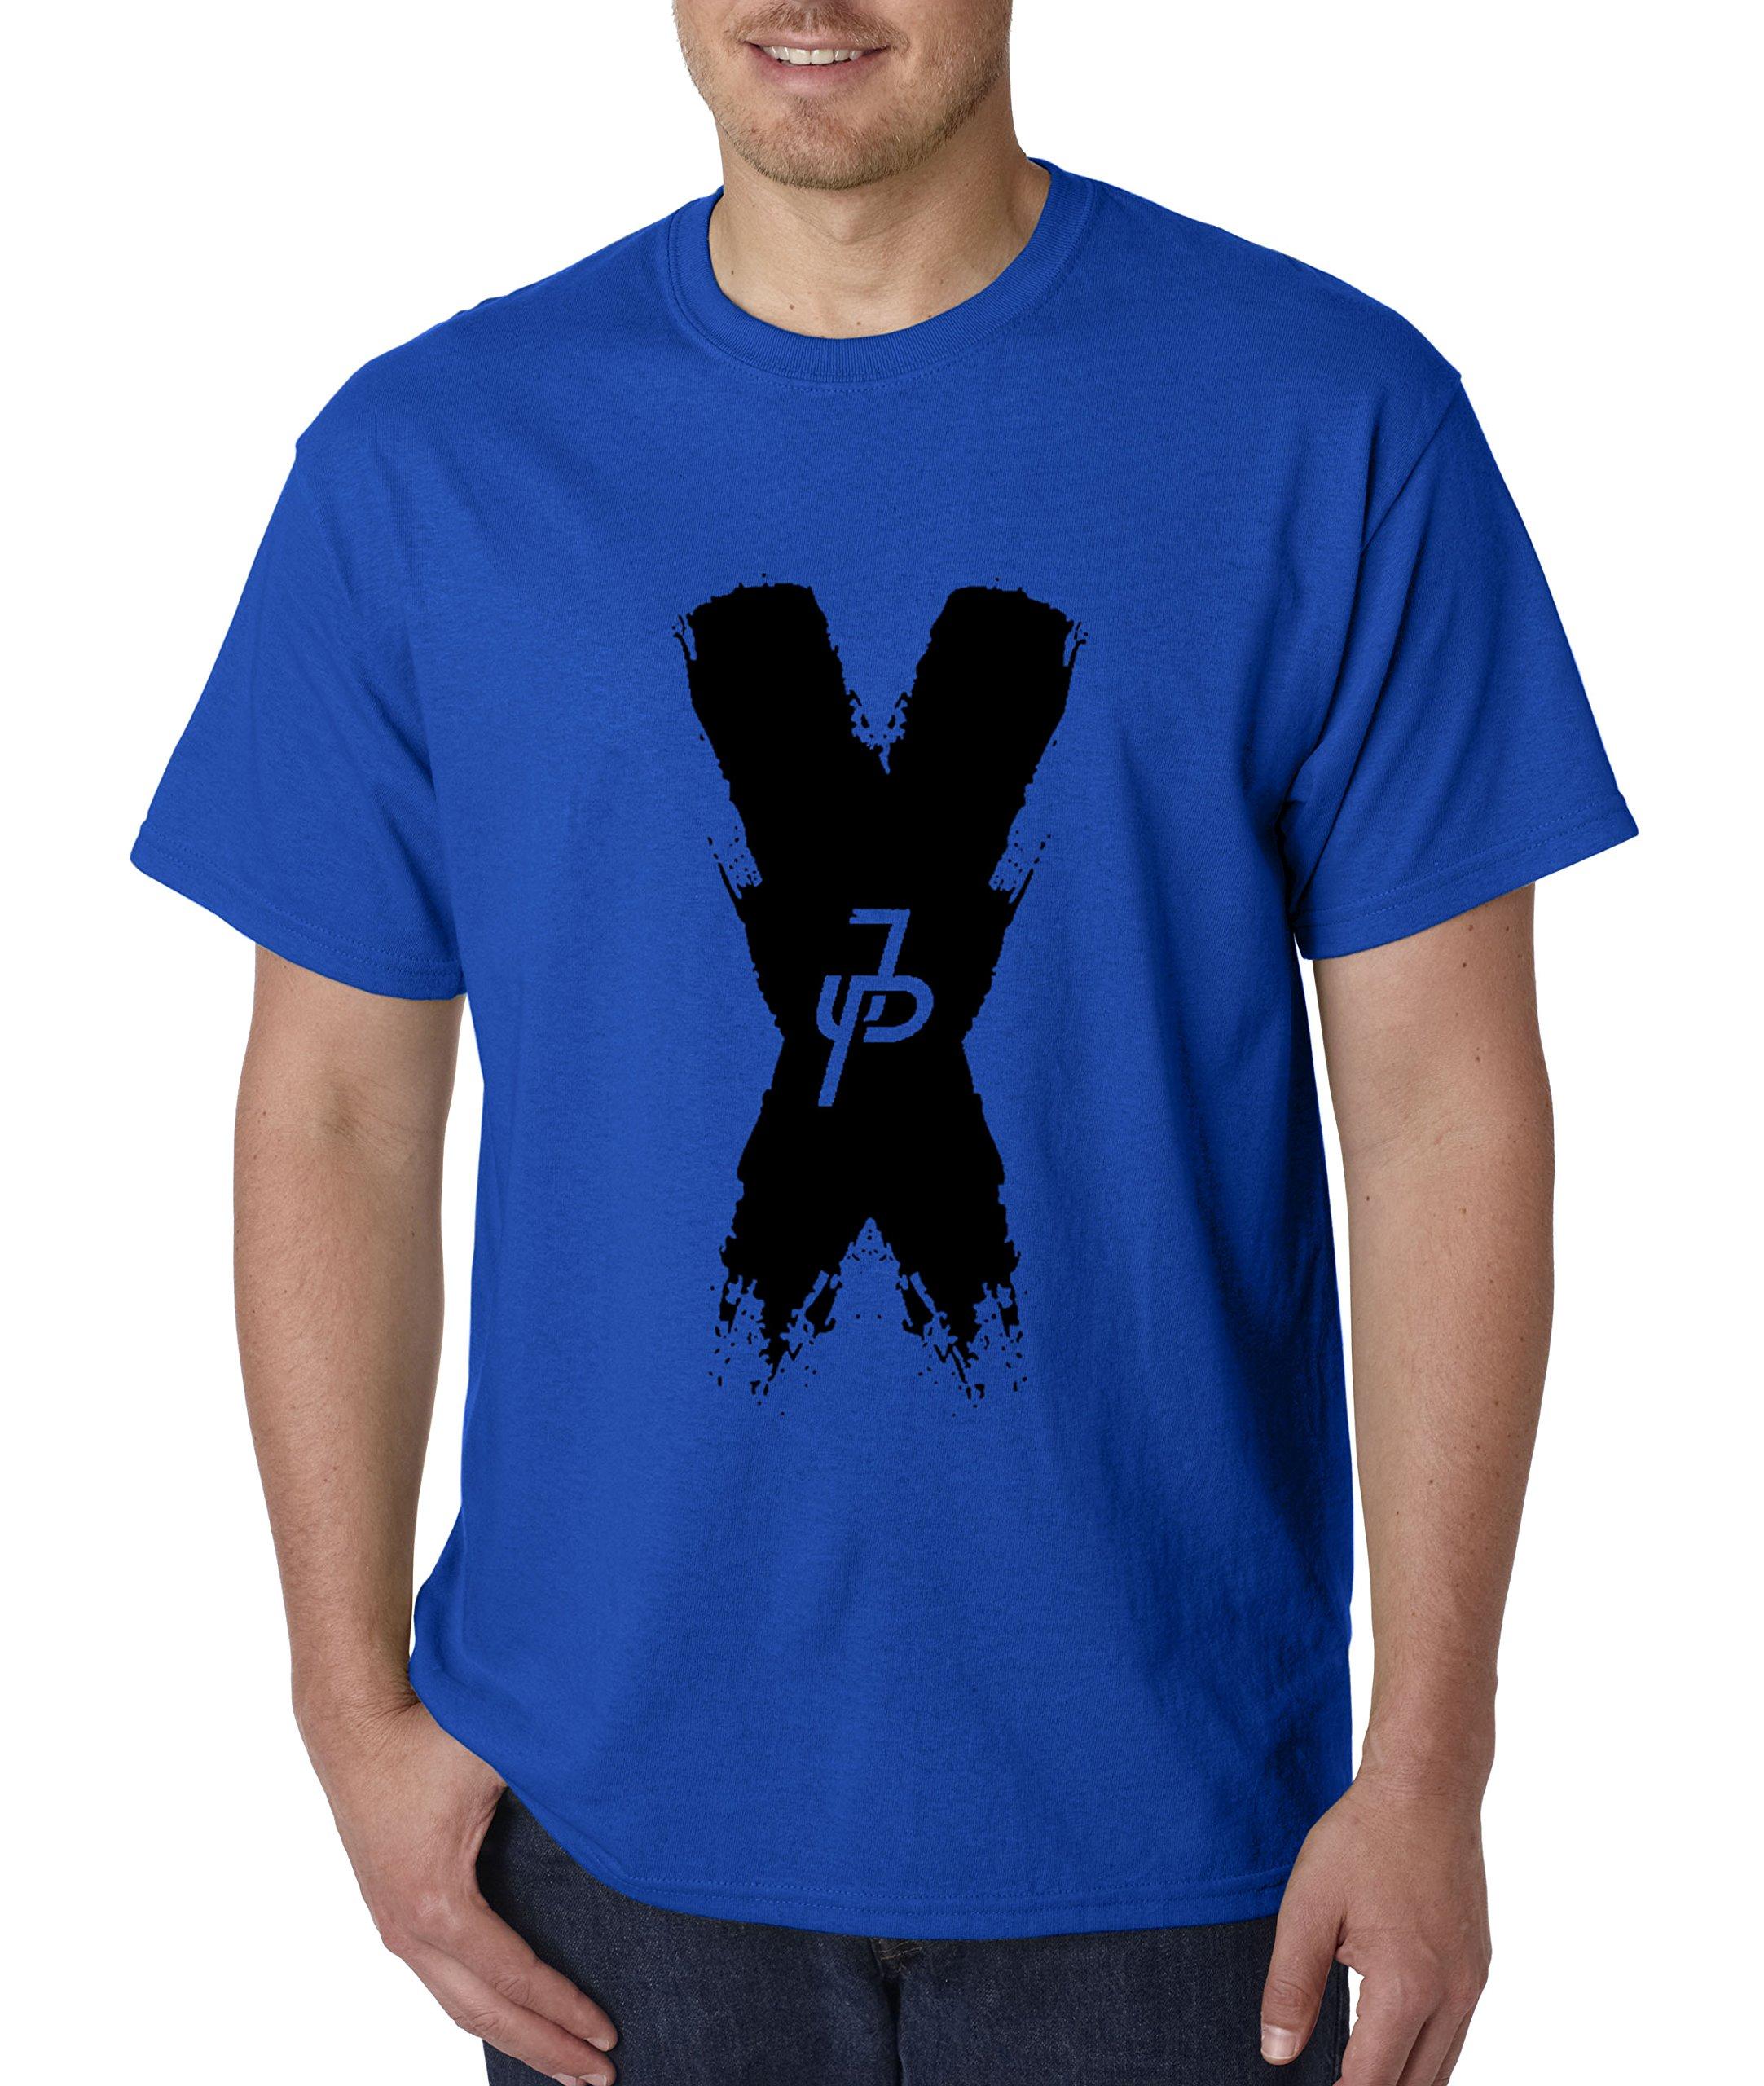 821 Unisex T Shirt Jake Paul X Team 10 3109